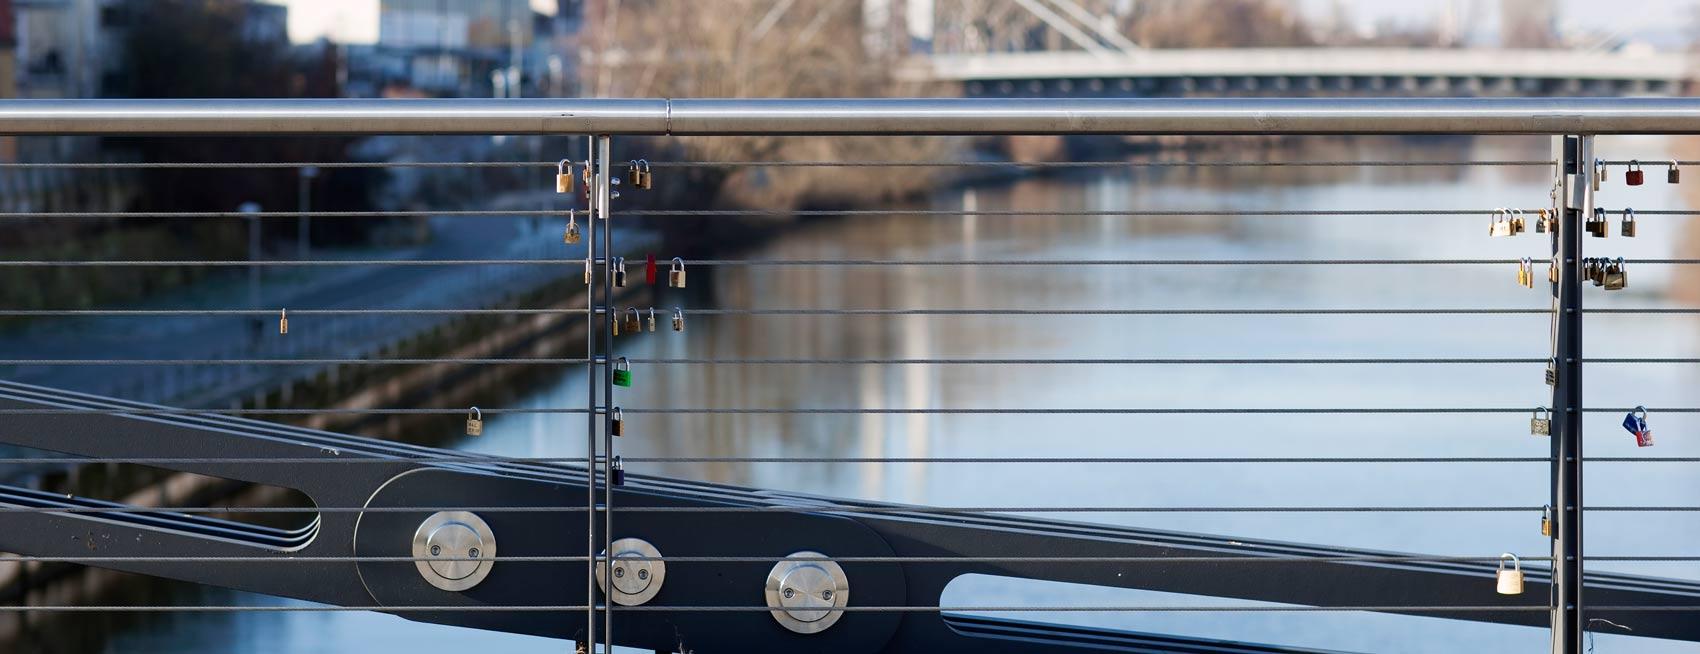 Brückengeländer I-SYS Edelstahl-Seilsysteme